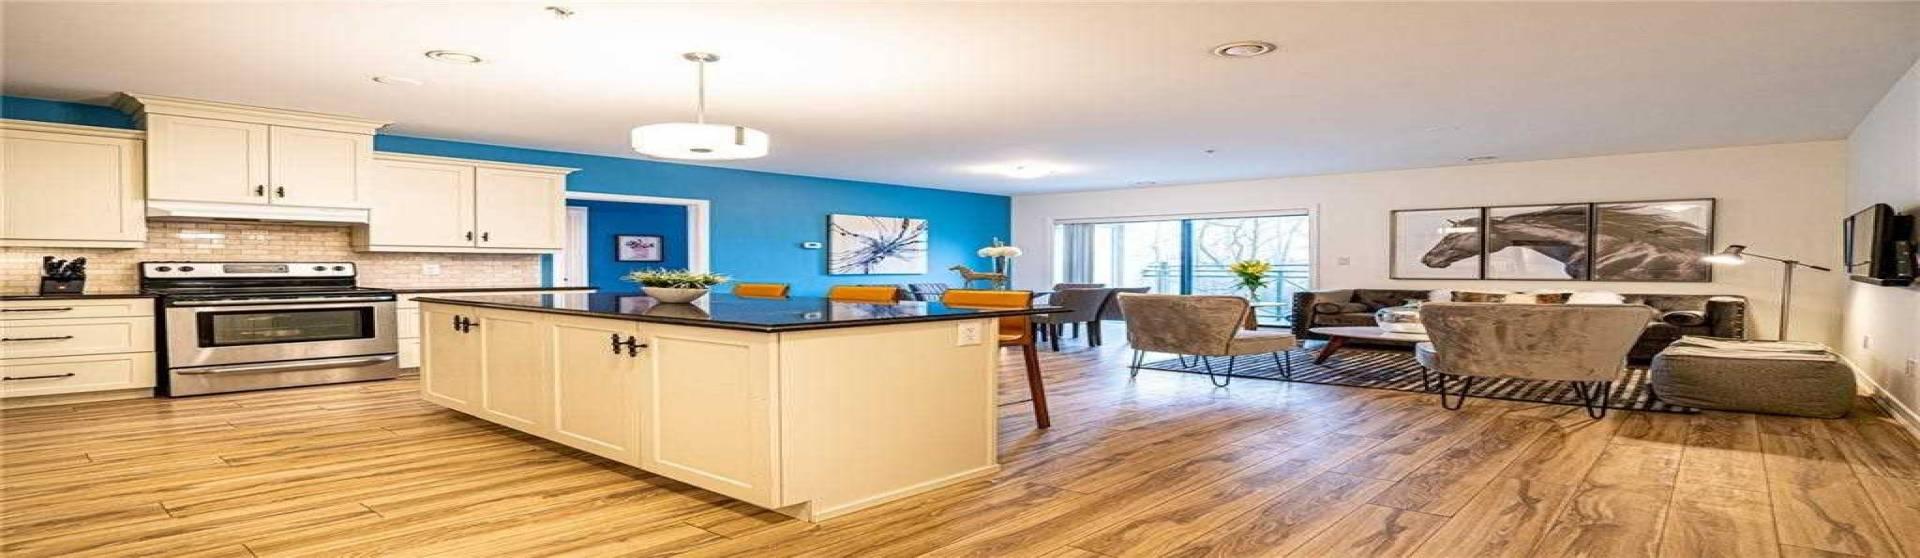 379 Scott St, St. Catharines, Ontario L2M 3W2, 2 Bedrooms Bedrooms, 7 Rooms Rooms,2 BathroomsBathrooms,Condo Apt,Sale,Scott,X4769244